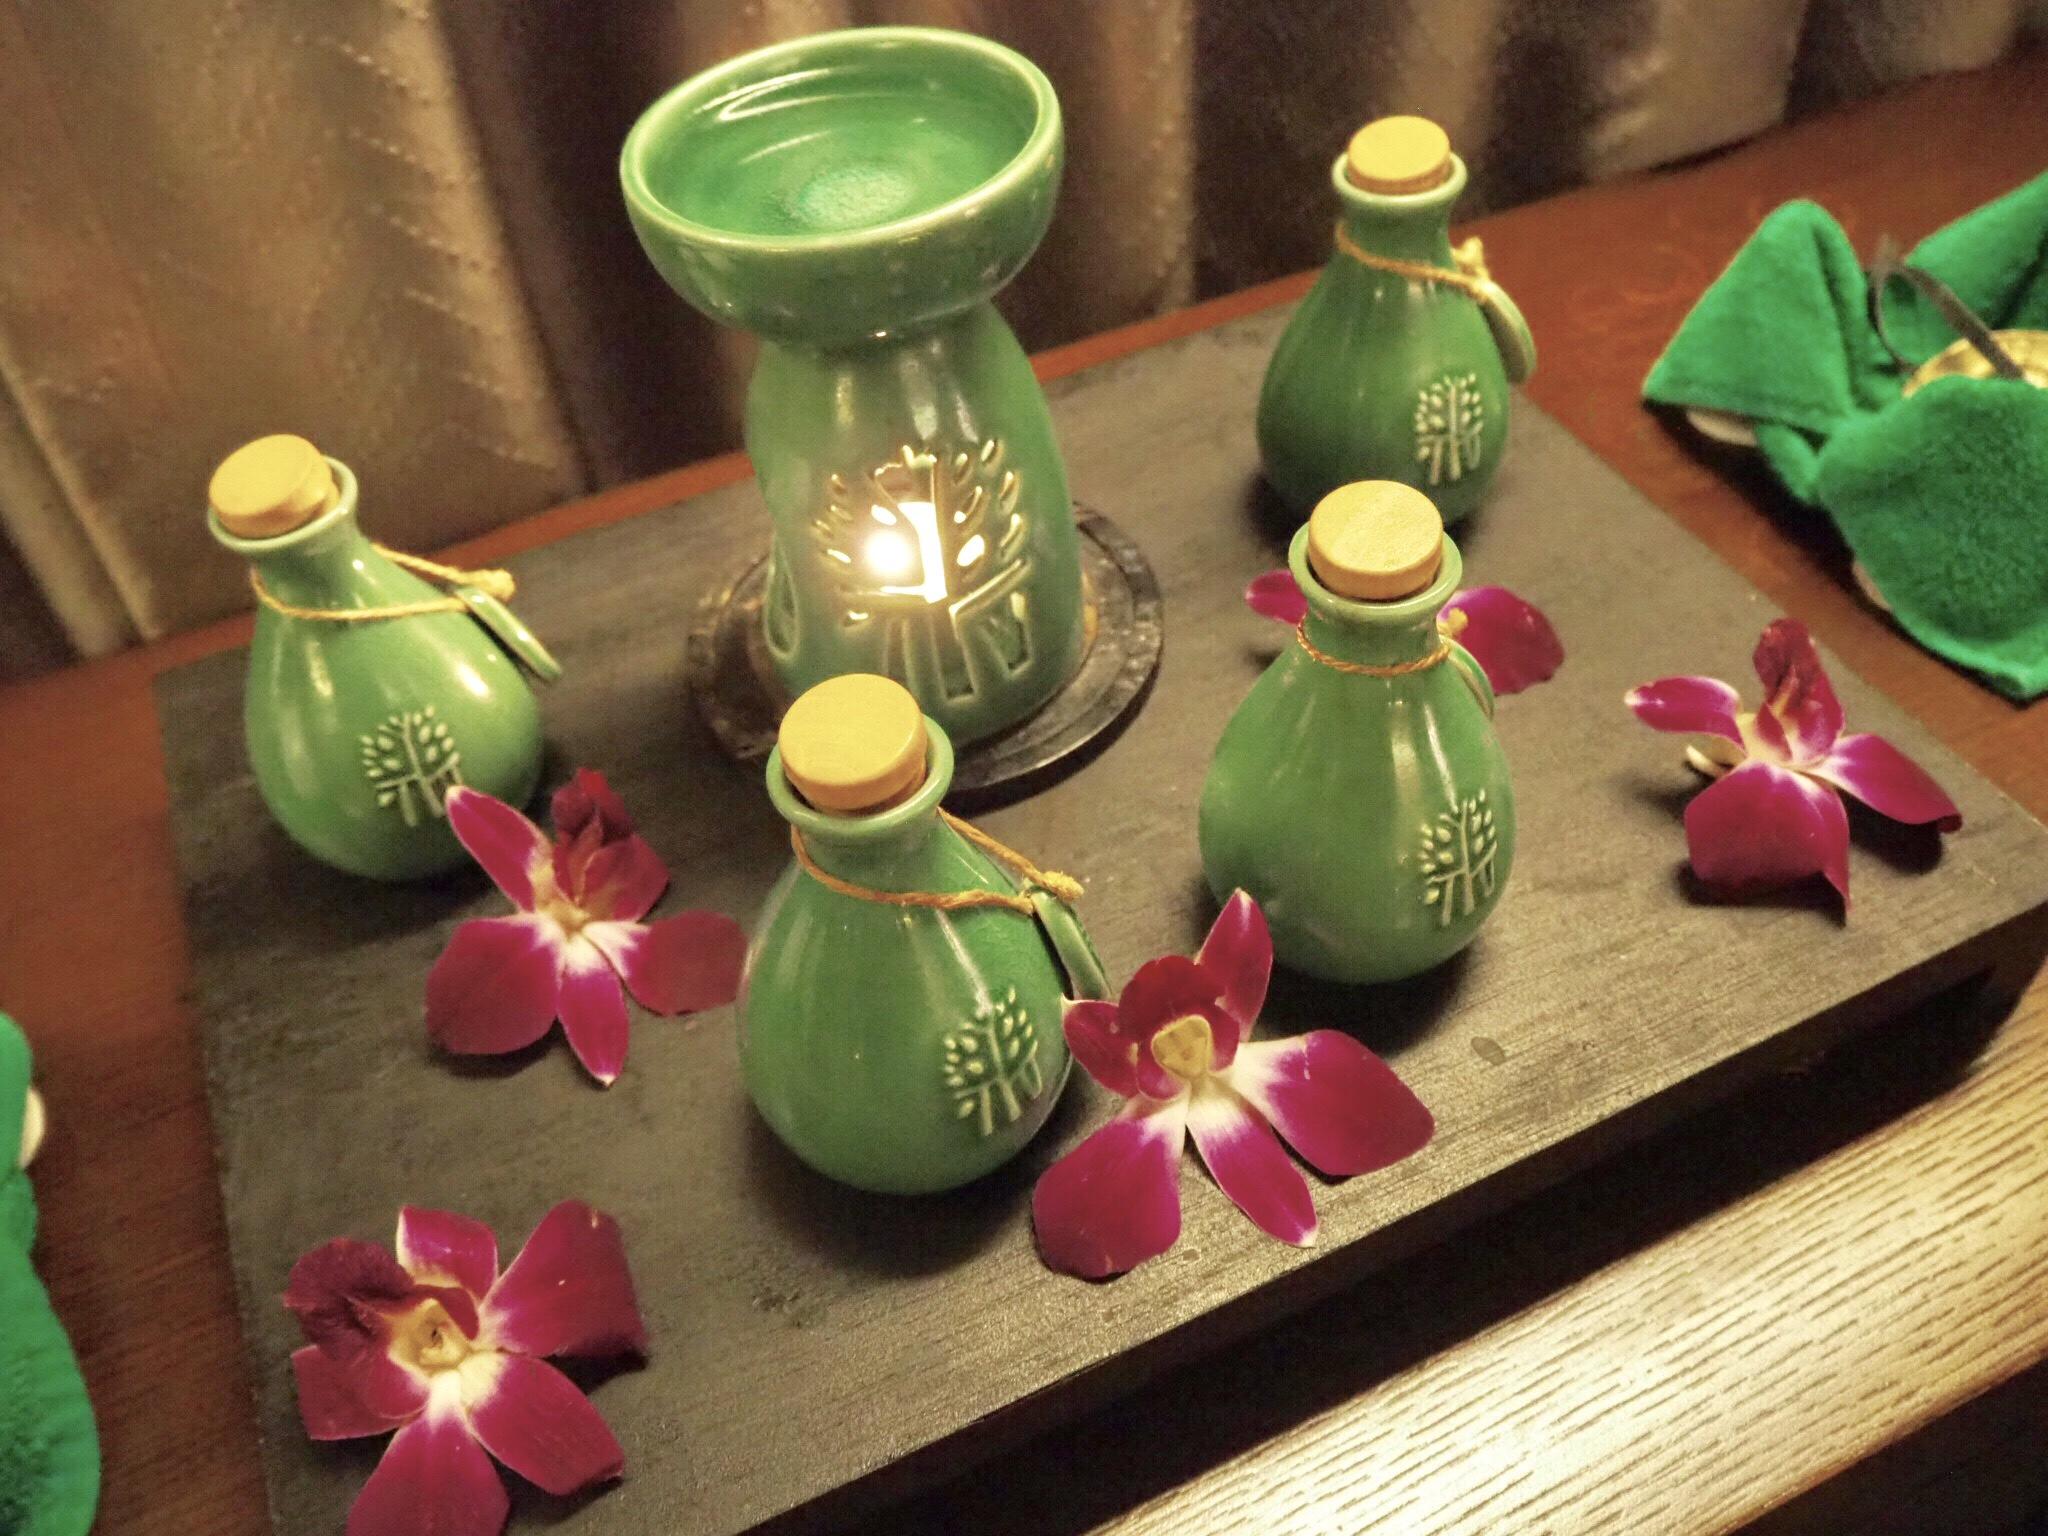 img 8073 - Banyan Tree Club & Spa Seoul - リピーターにお勧めしたい韓国ソウルのちょっと贅沢なステイ先